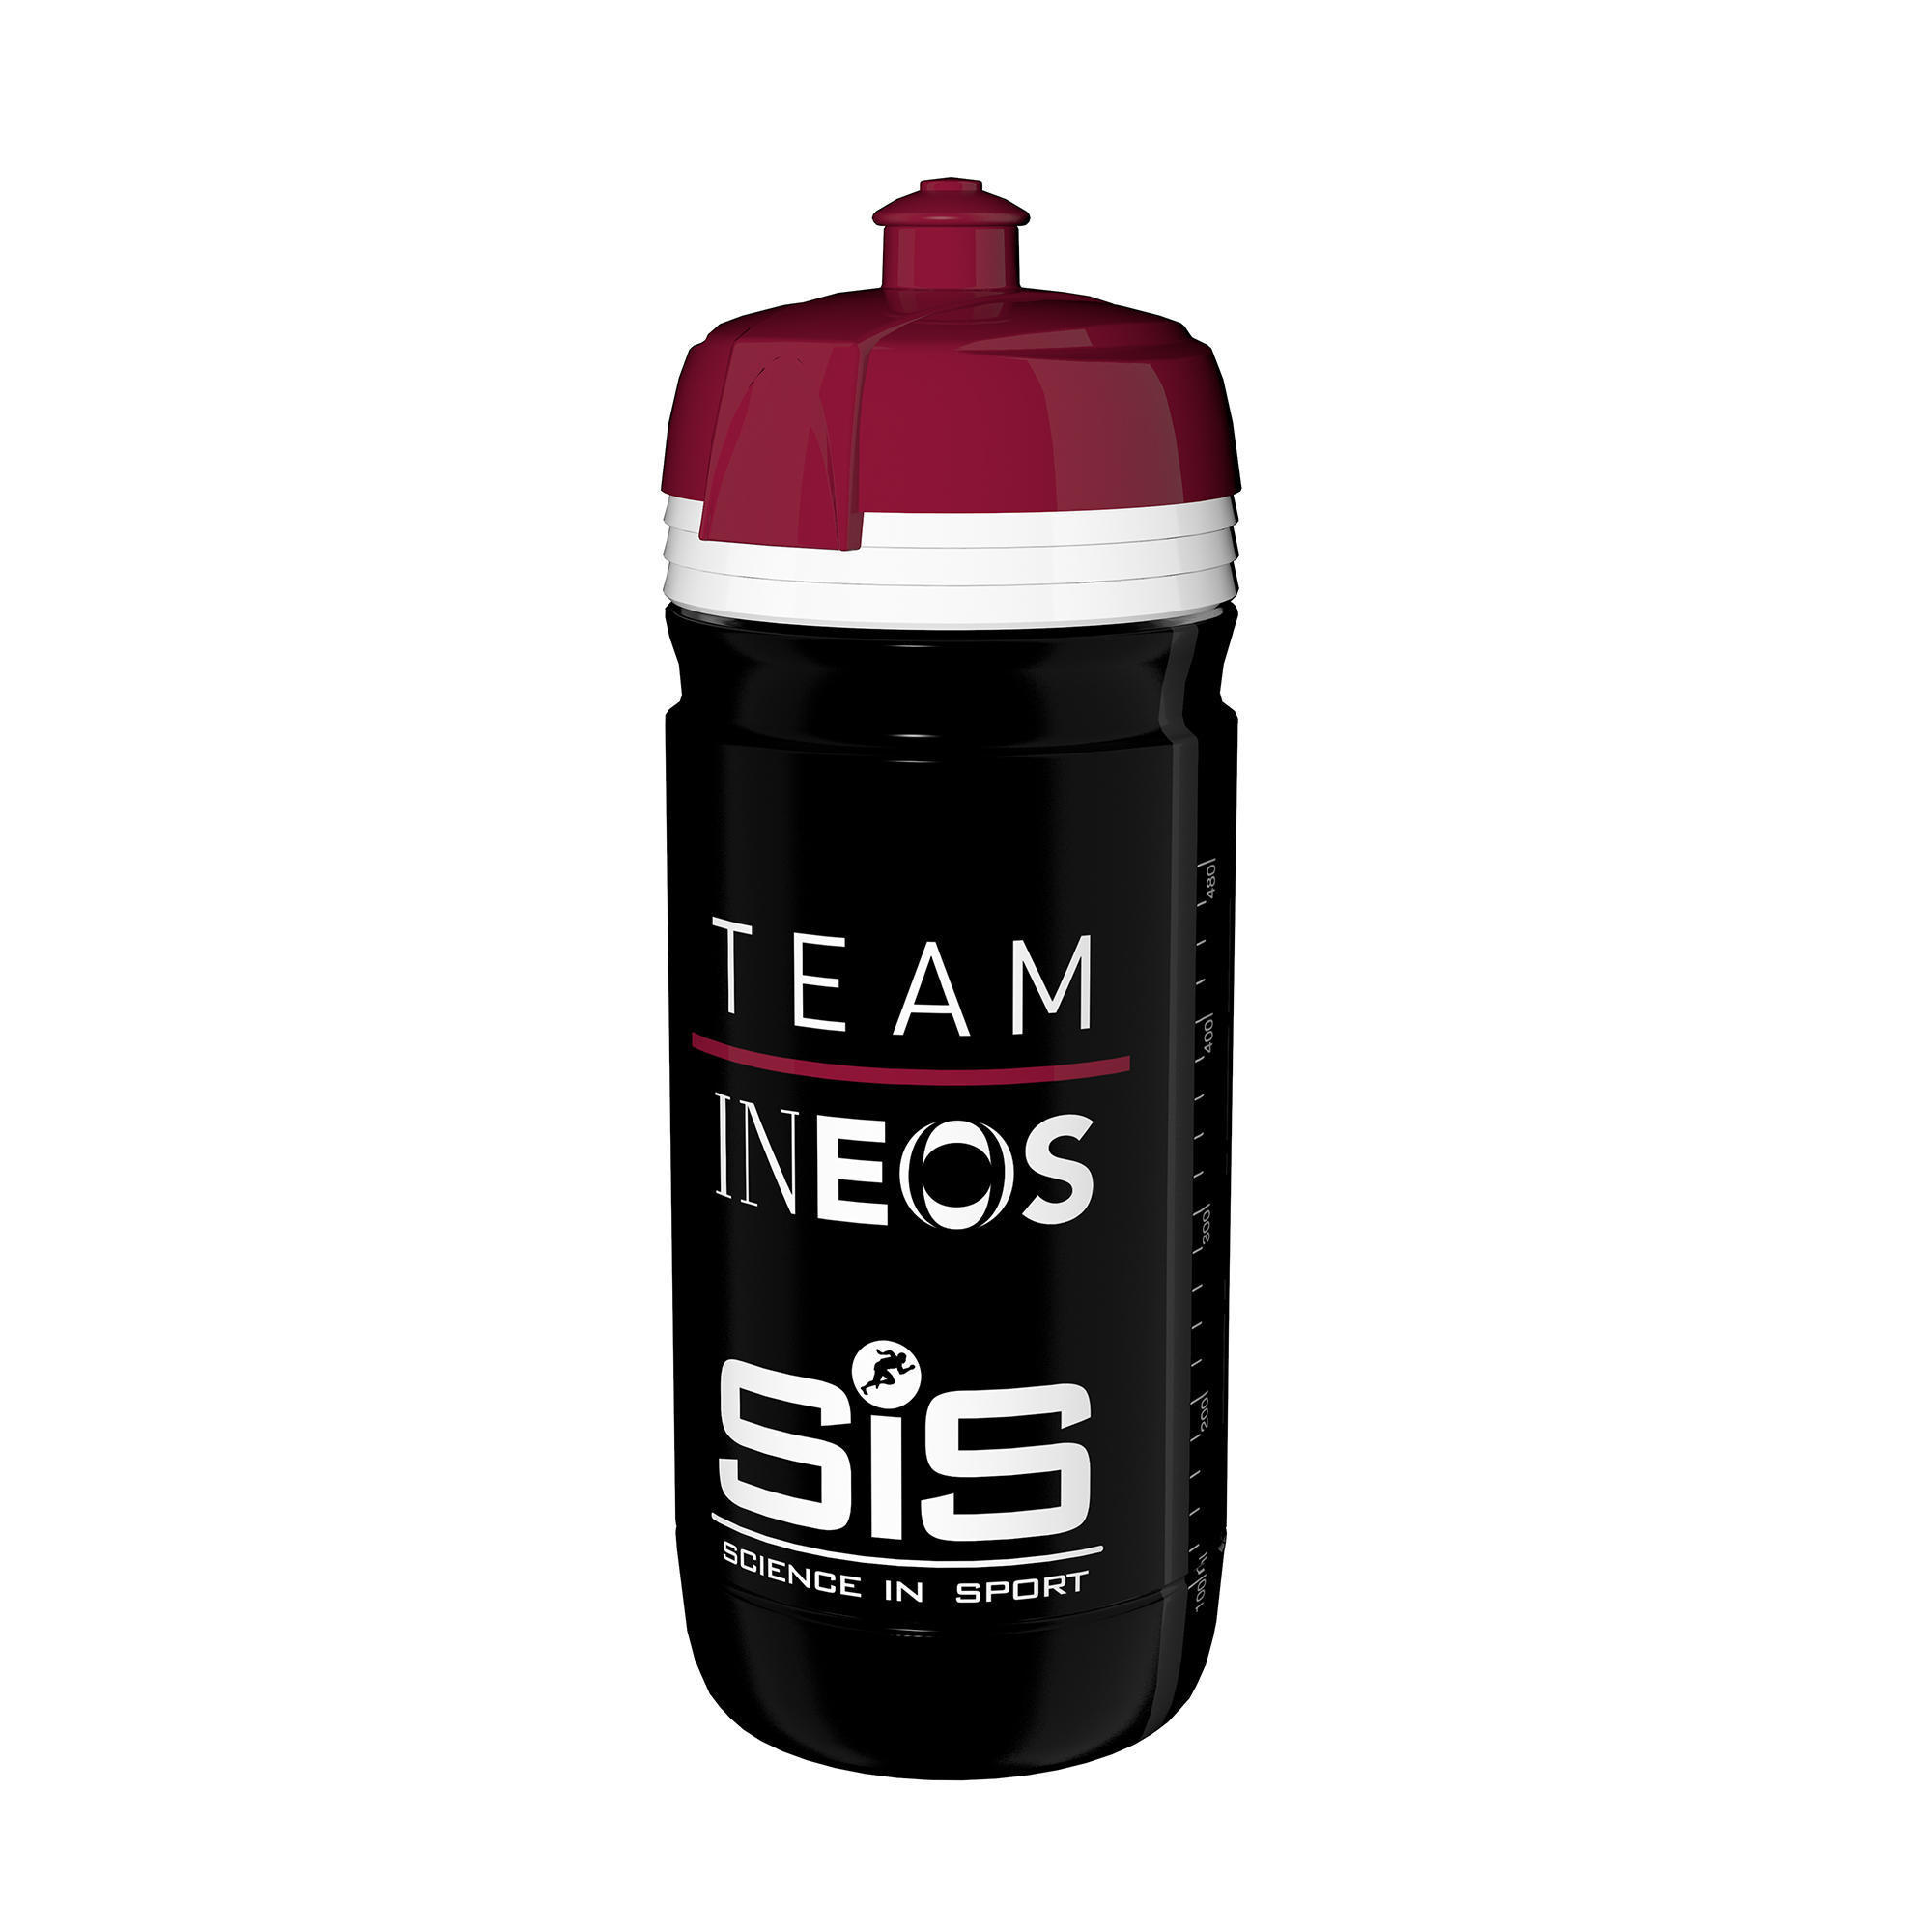 Elite Bidon racefiets Team Ineos 2020 Corsa 550 ml